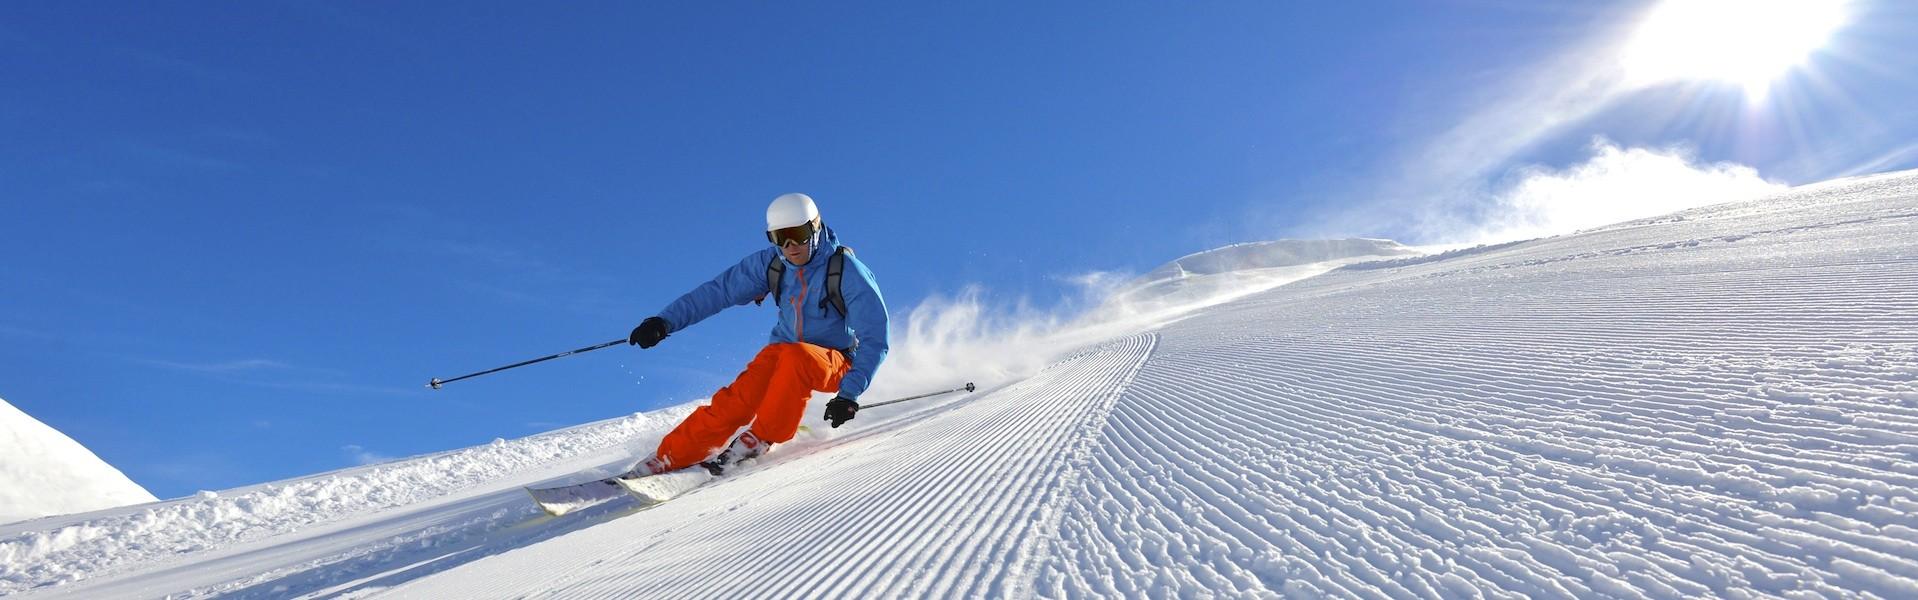 2-ski-david-machet-2444